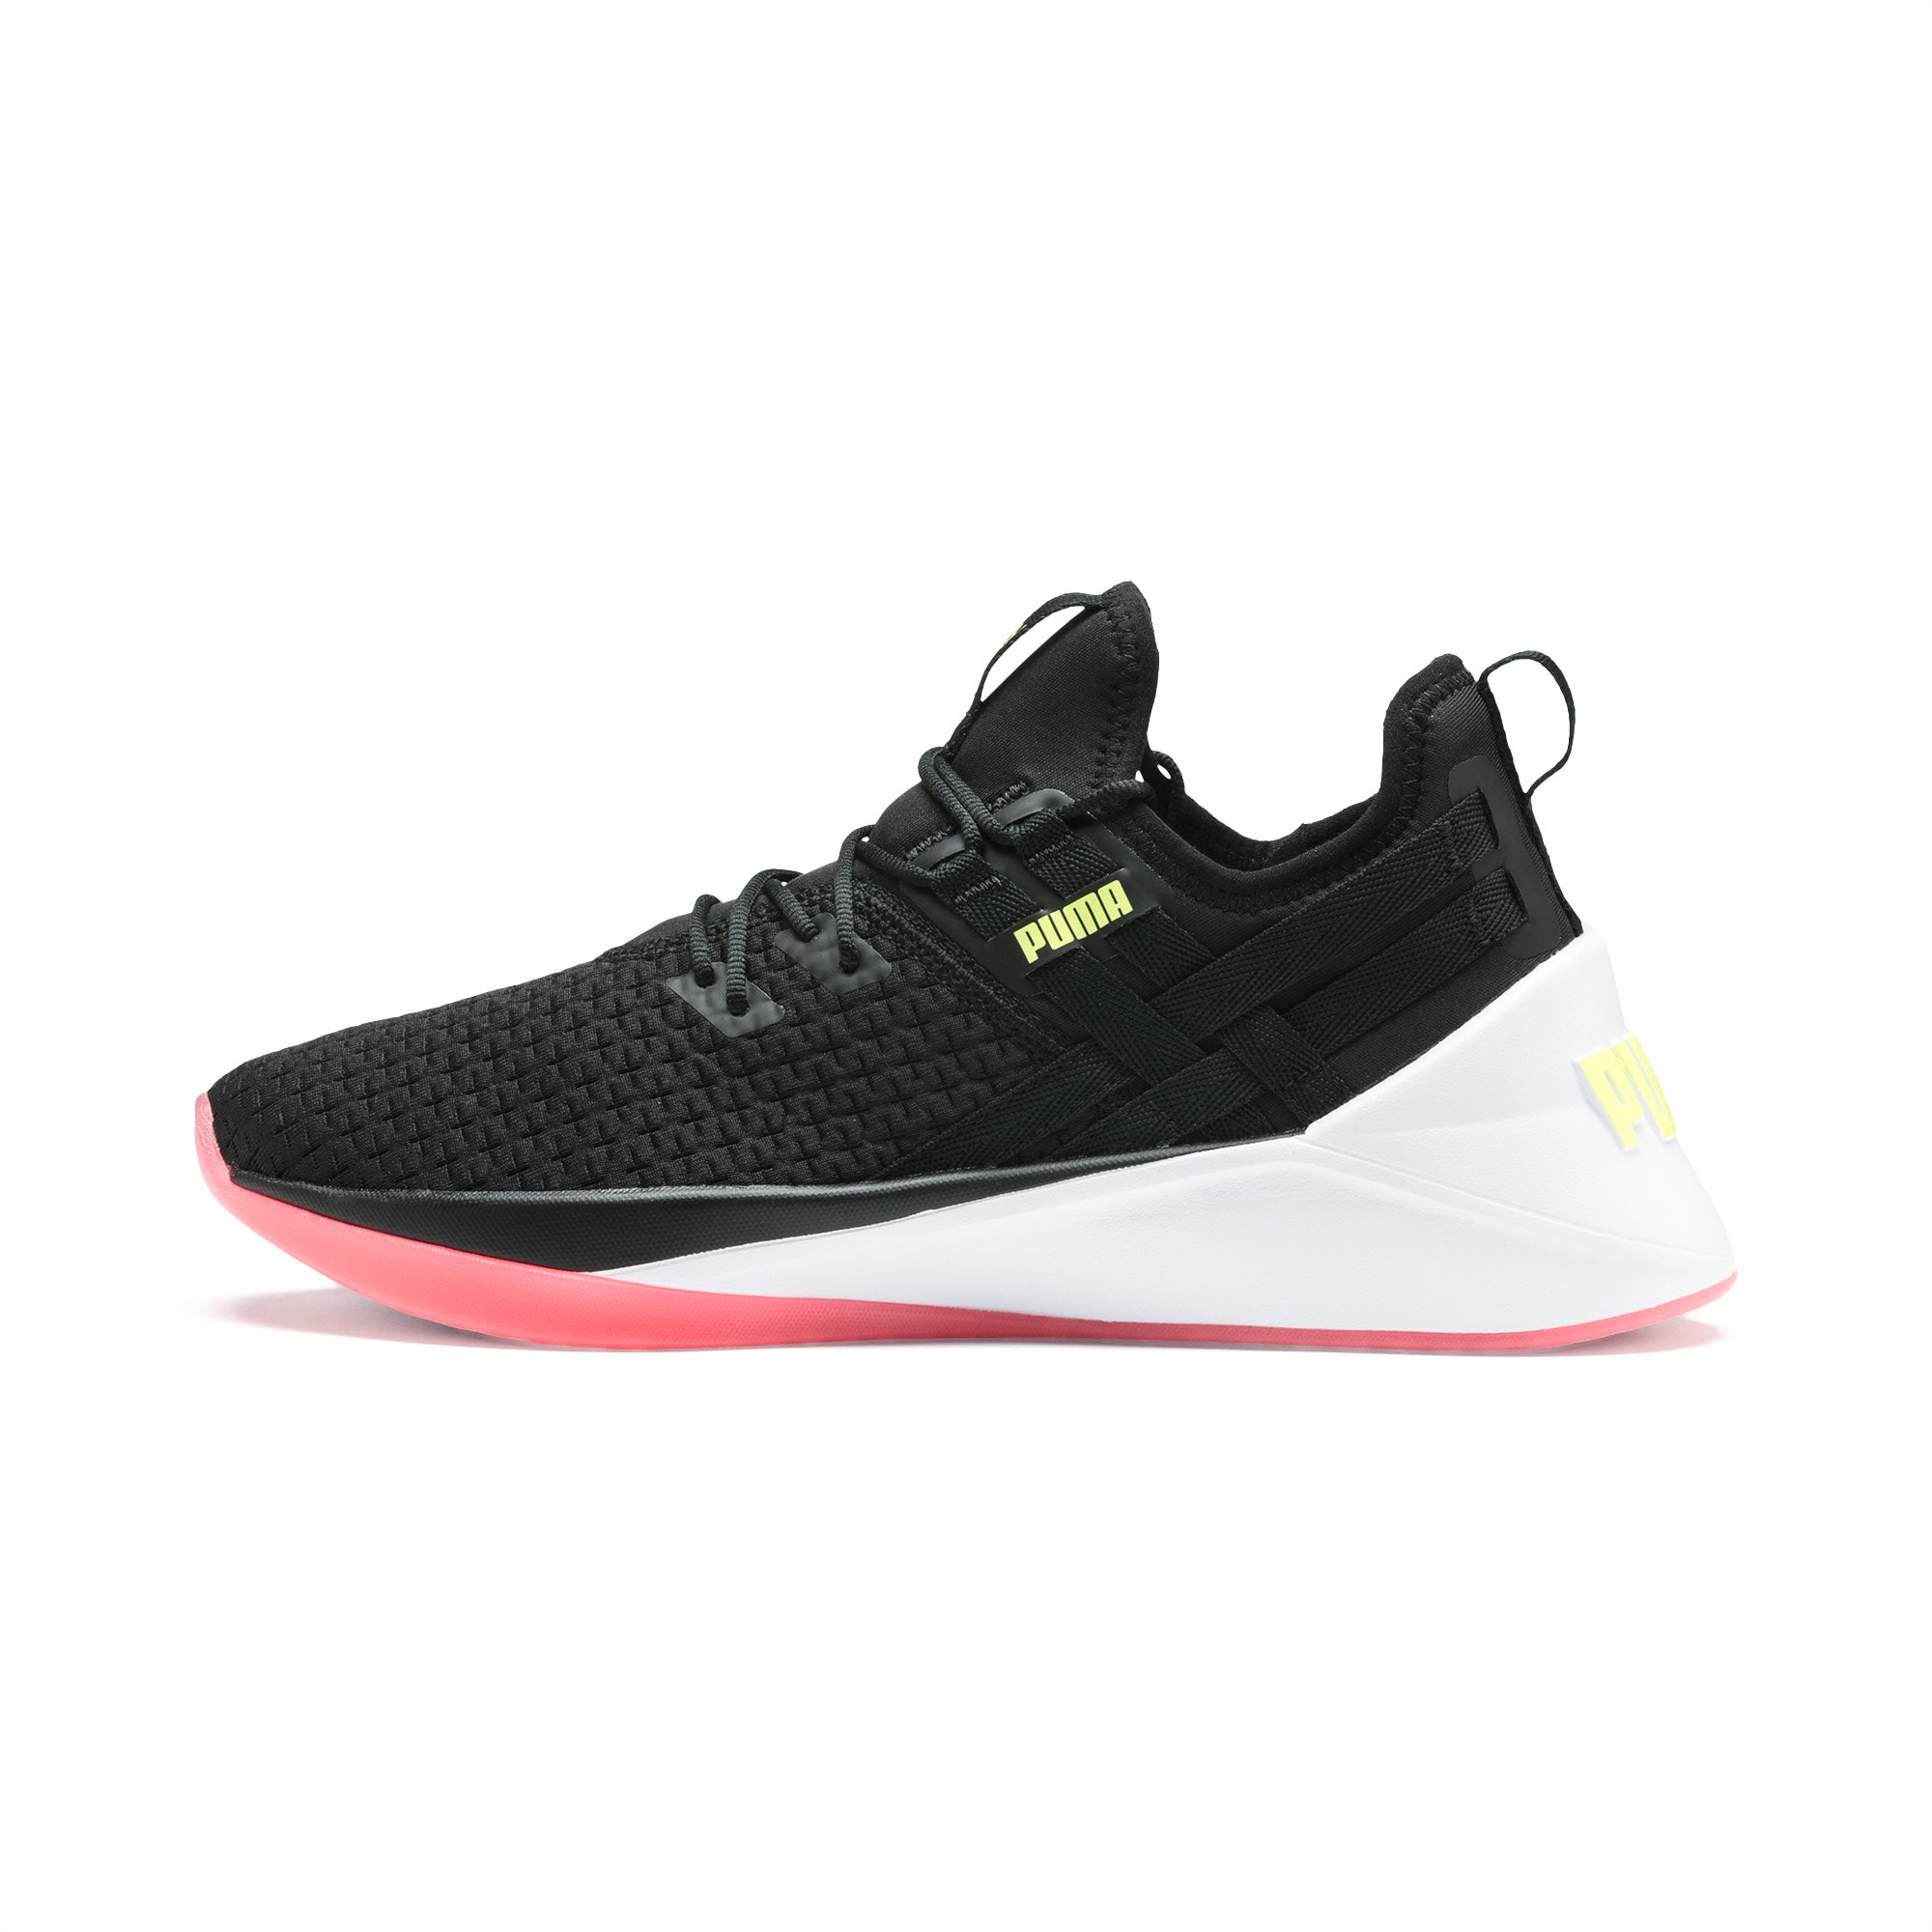 Jaab XT Women's Training Shoes